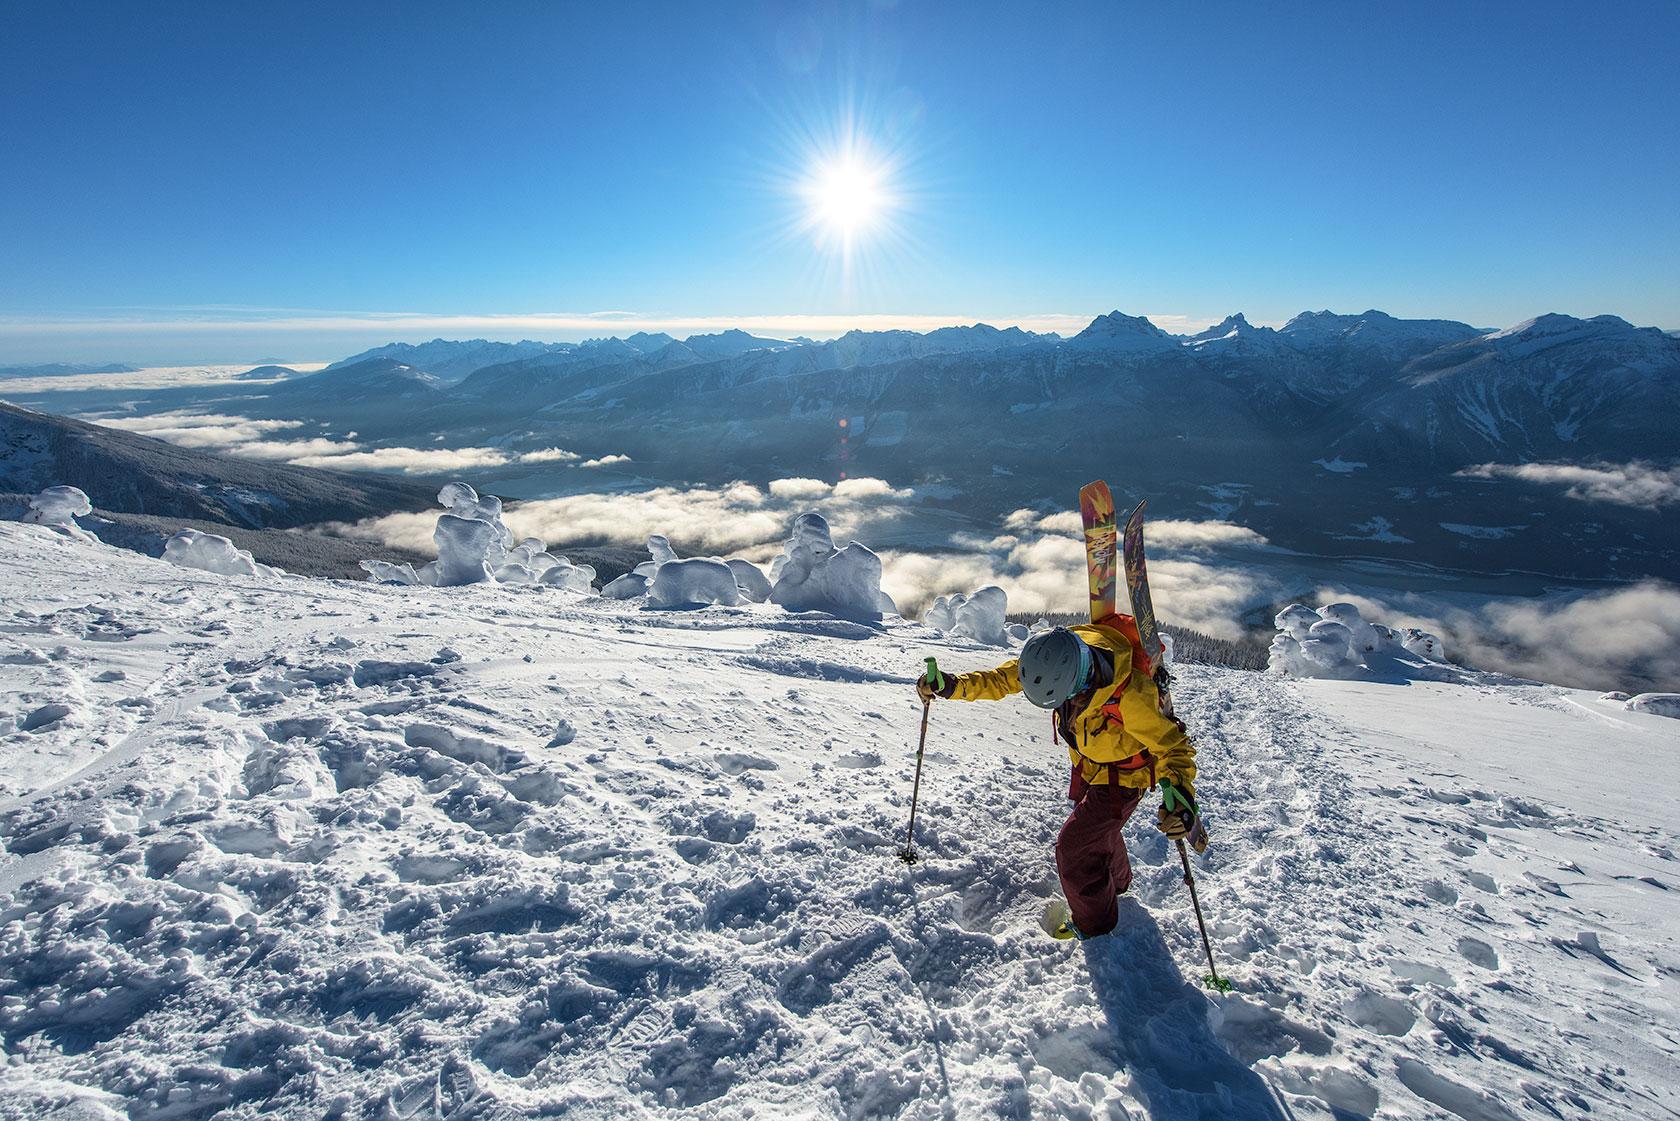 austin-trigg-patagonia-banff-alberta-winter-revelstoke-bc-british-columbia-mountains-valley-snow-skiing-touring-backcountry-adventure-boot-pack.jpg